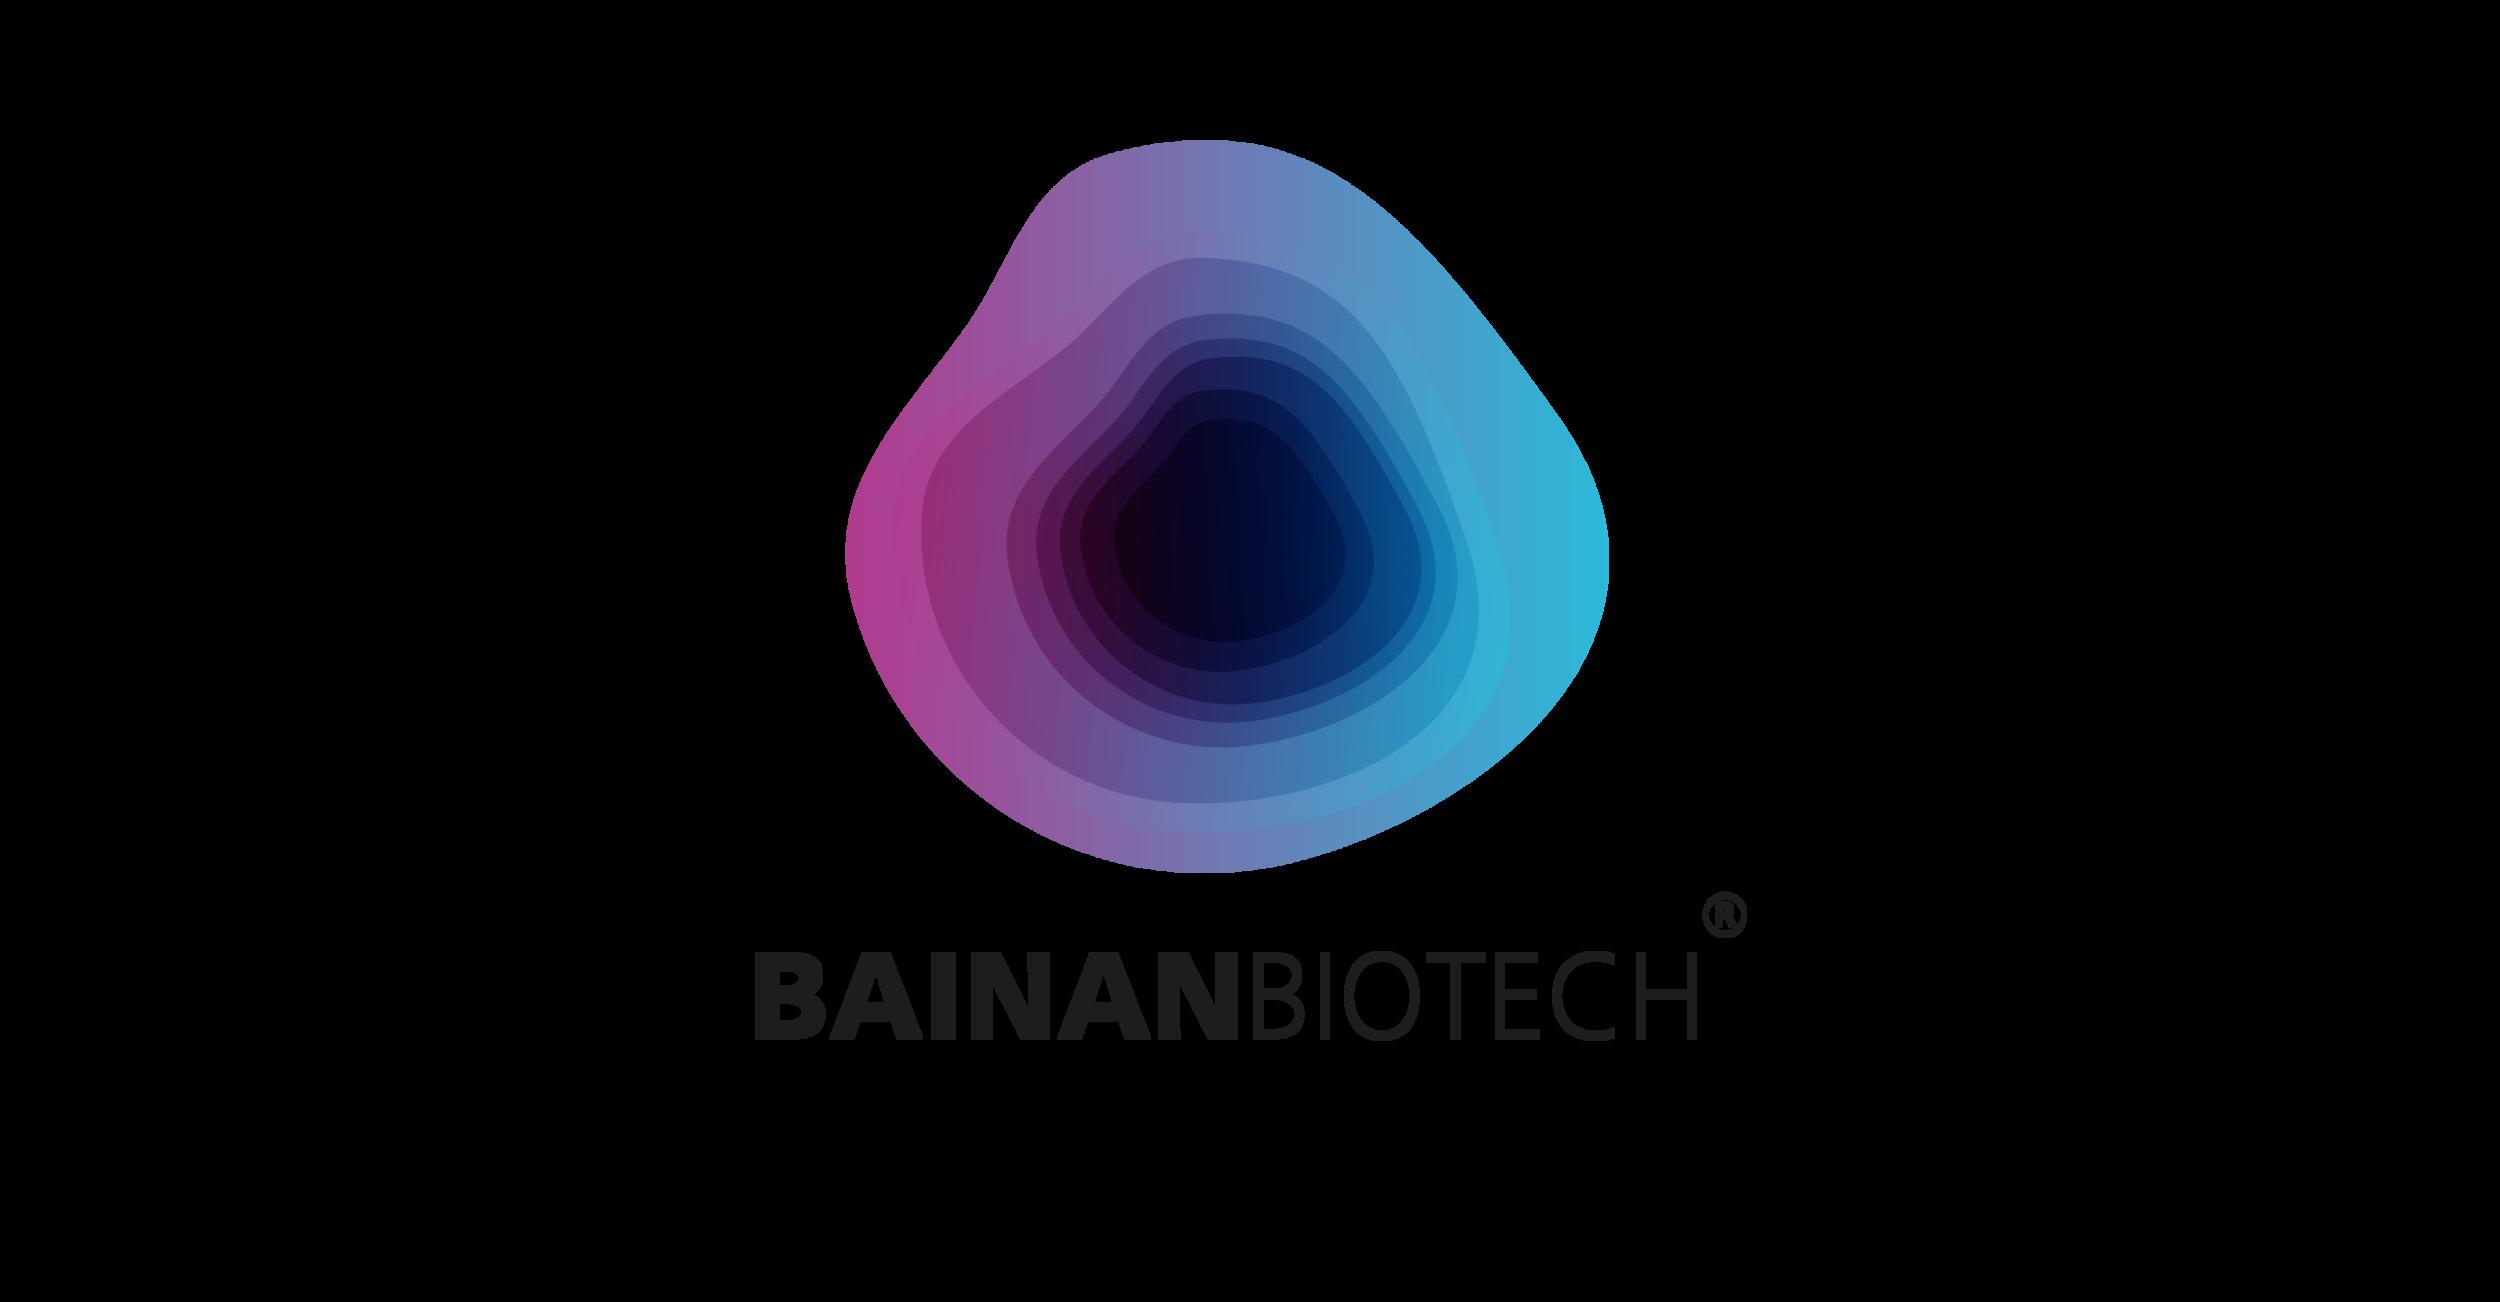 BainanBiotech_Black_02.png